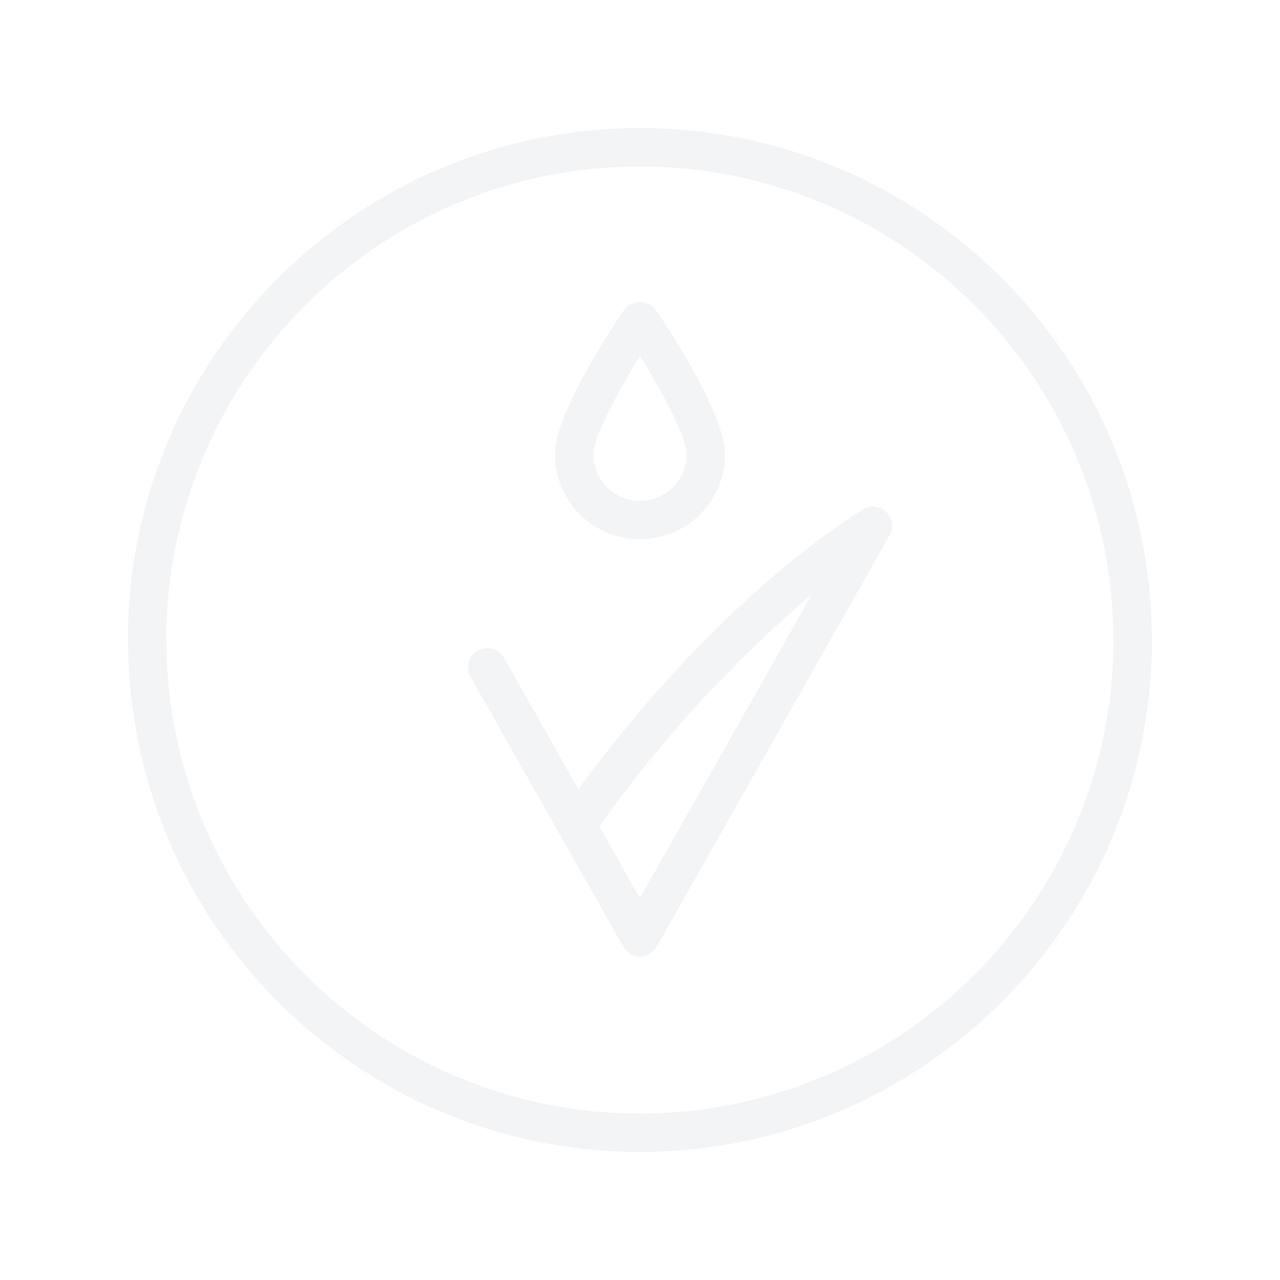 BIOKAP Nutricolor 7.3 Golden Blond Permanent Hair Dye 140ml